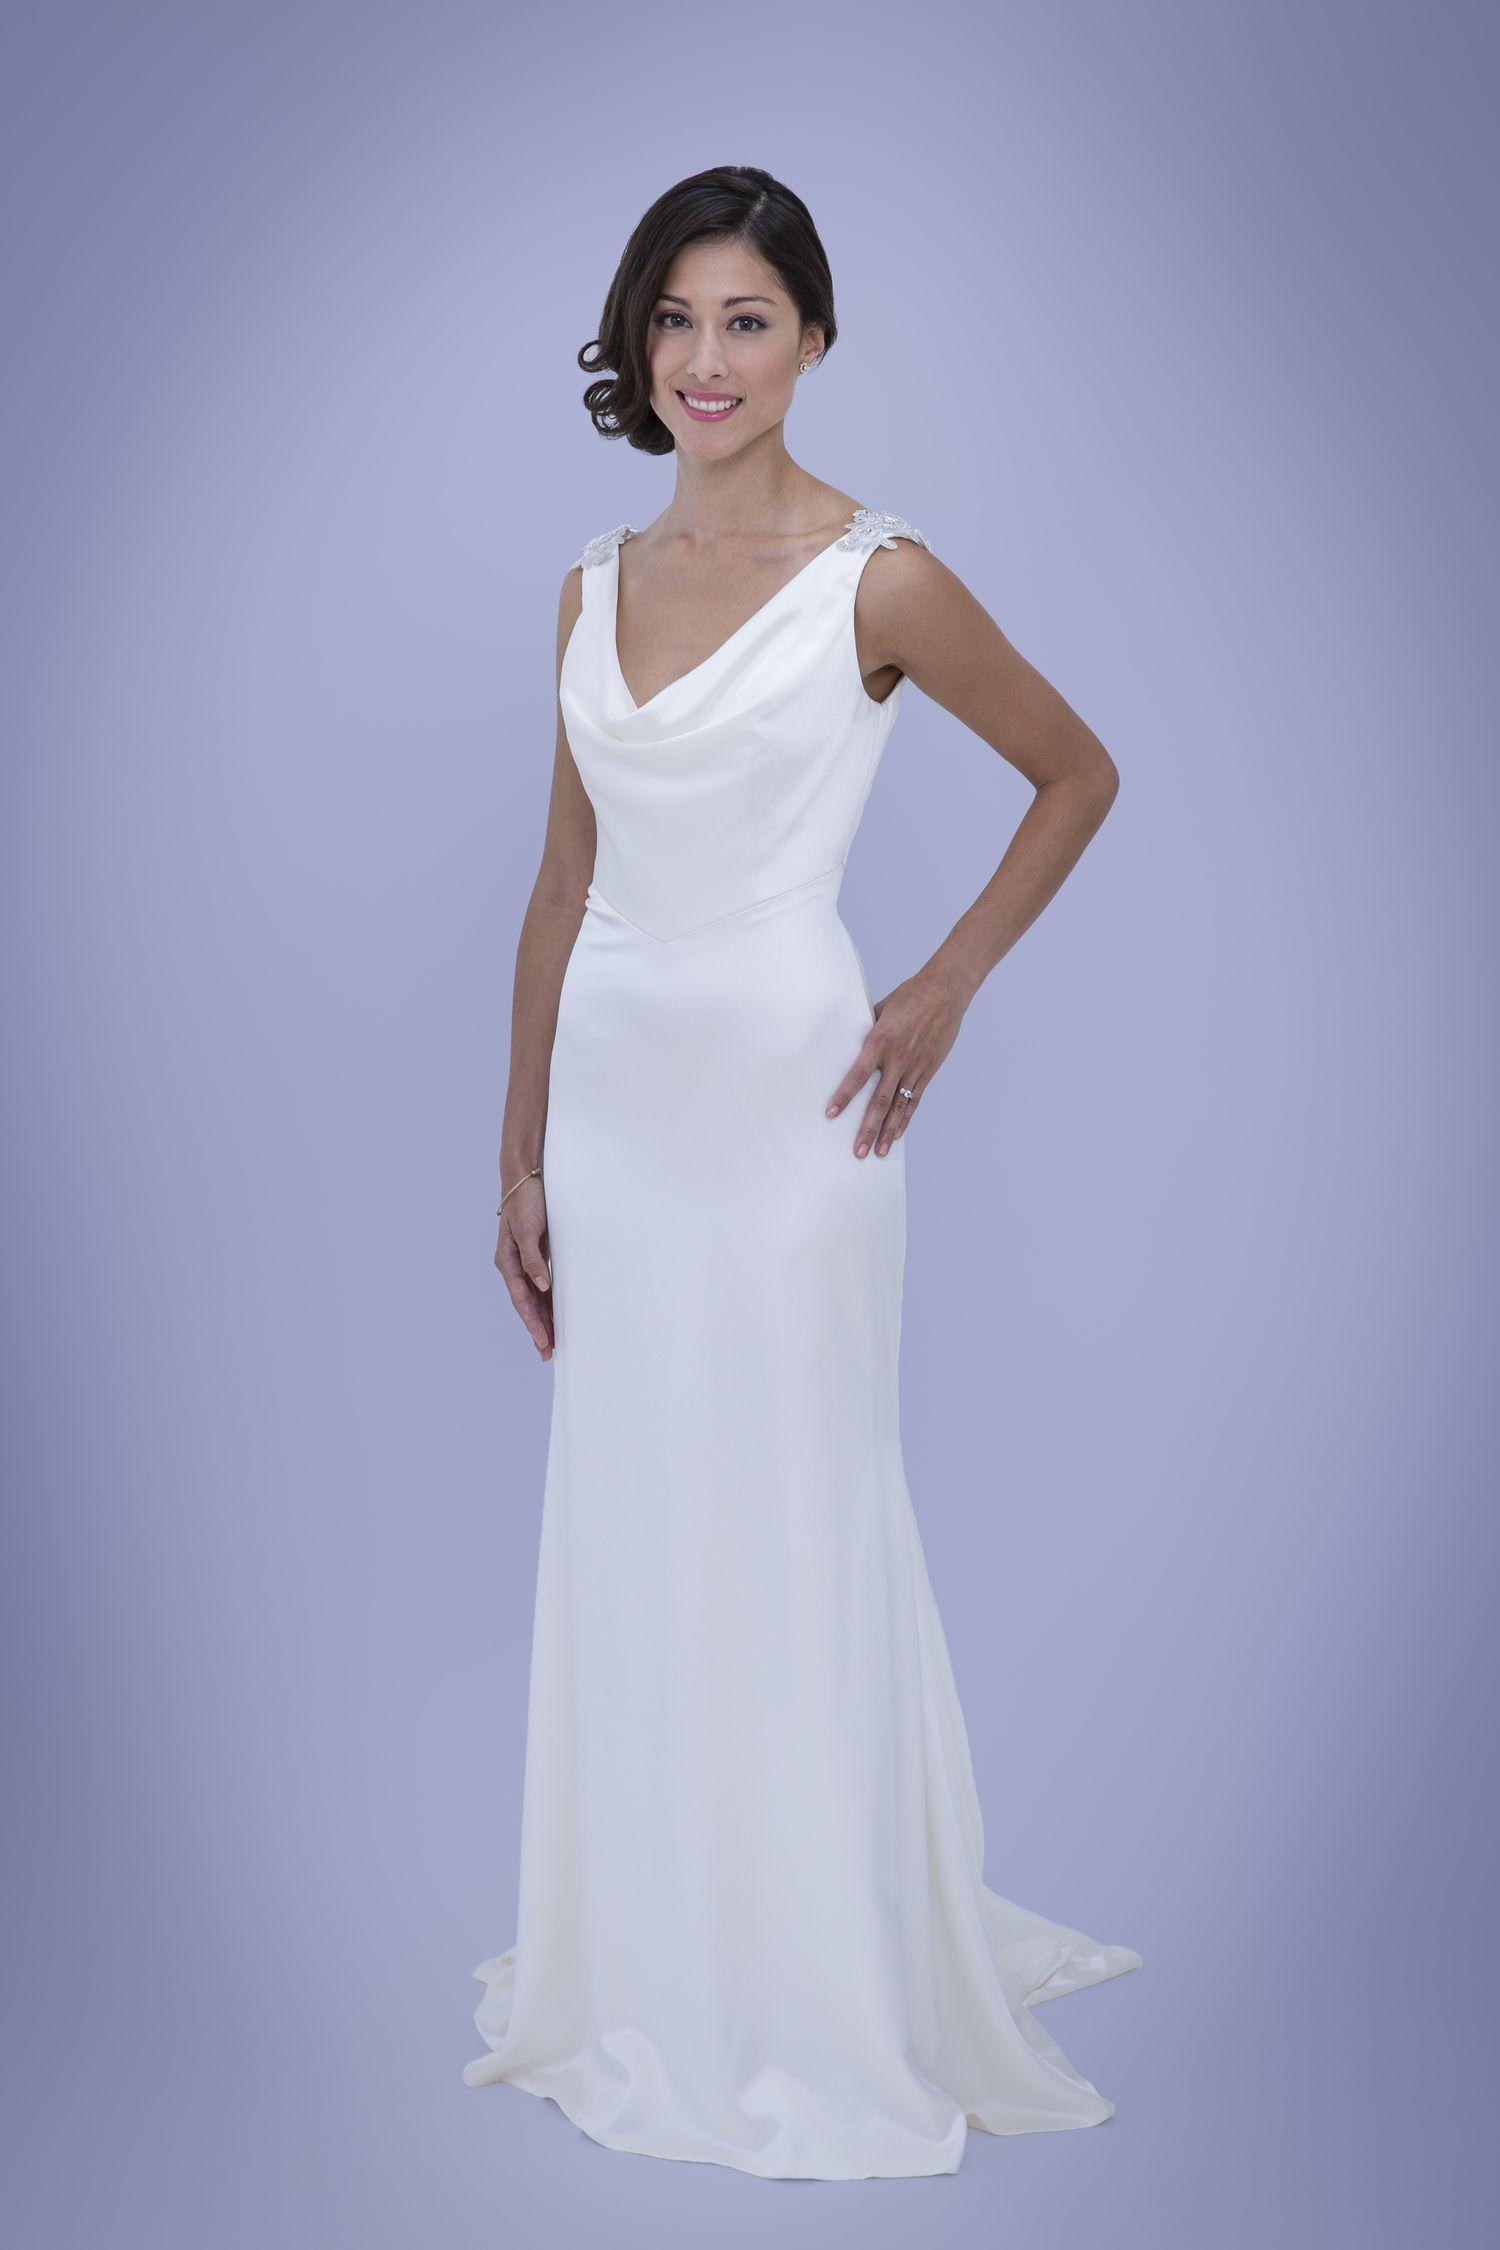 Wedding Dresses San Francisco   Mildred Cowl Neck Silk Wedding Dress Perfect For Old Hollywood